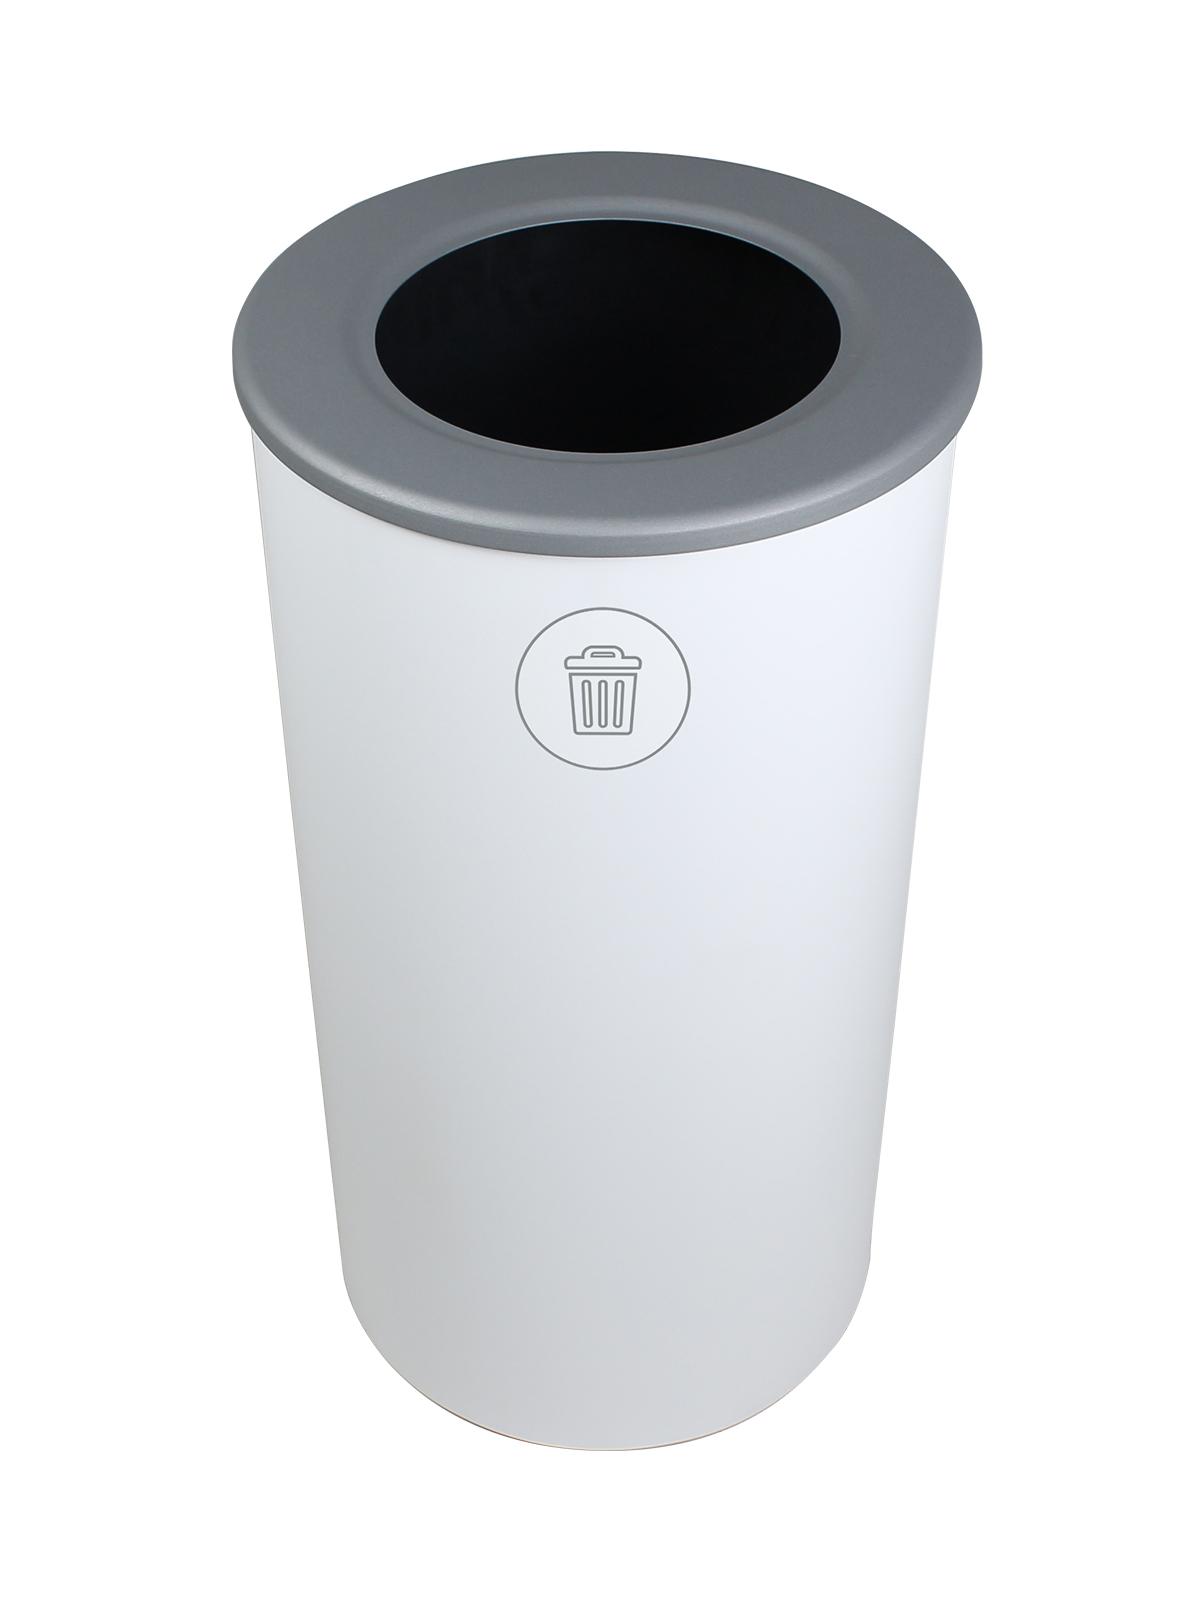 SPECTRUM - Single - Round - Waste - Full - White